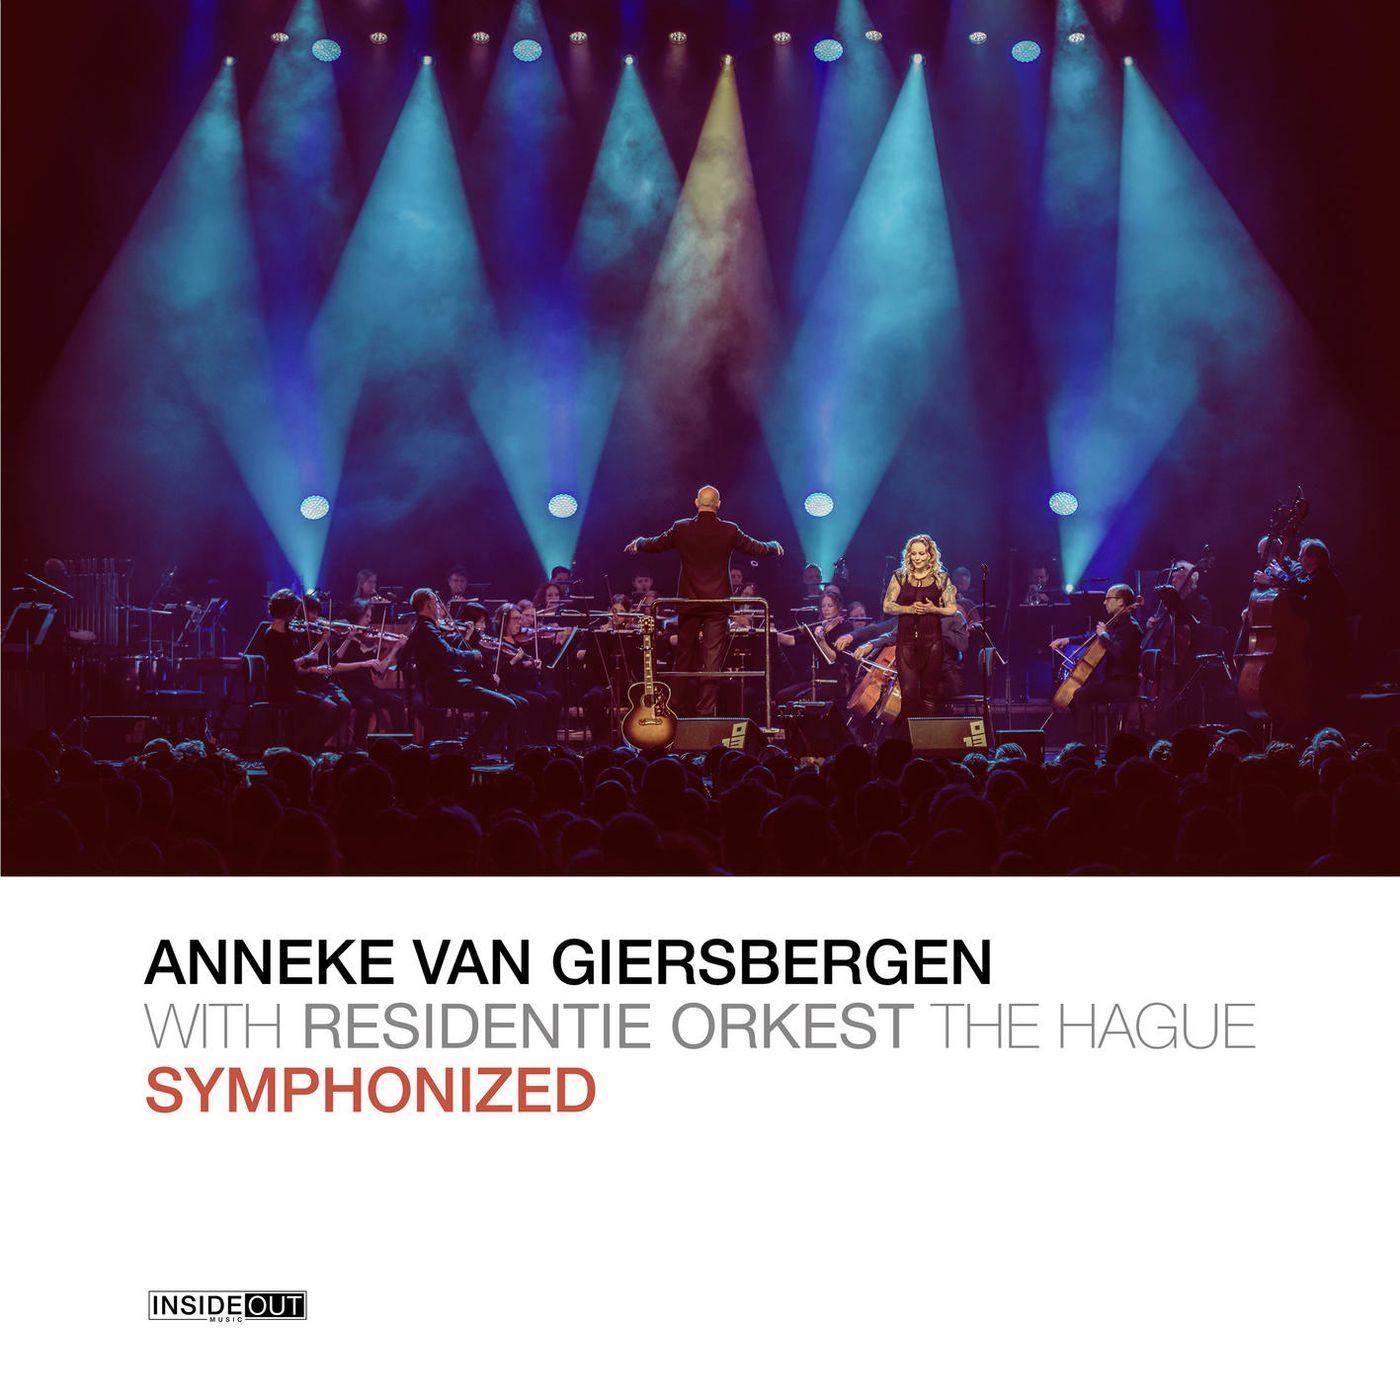 Anneke Van Giersbergen - Symphonized album cover